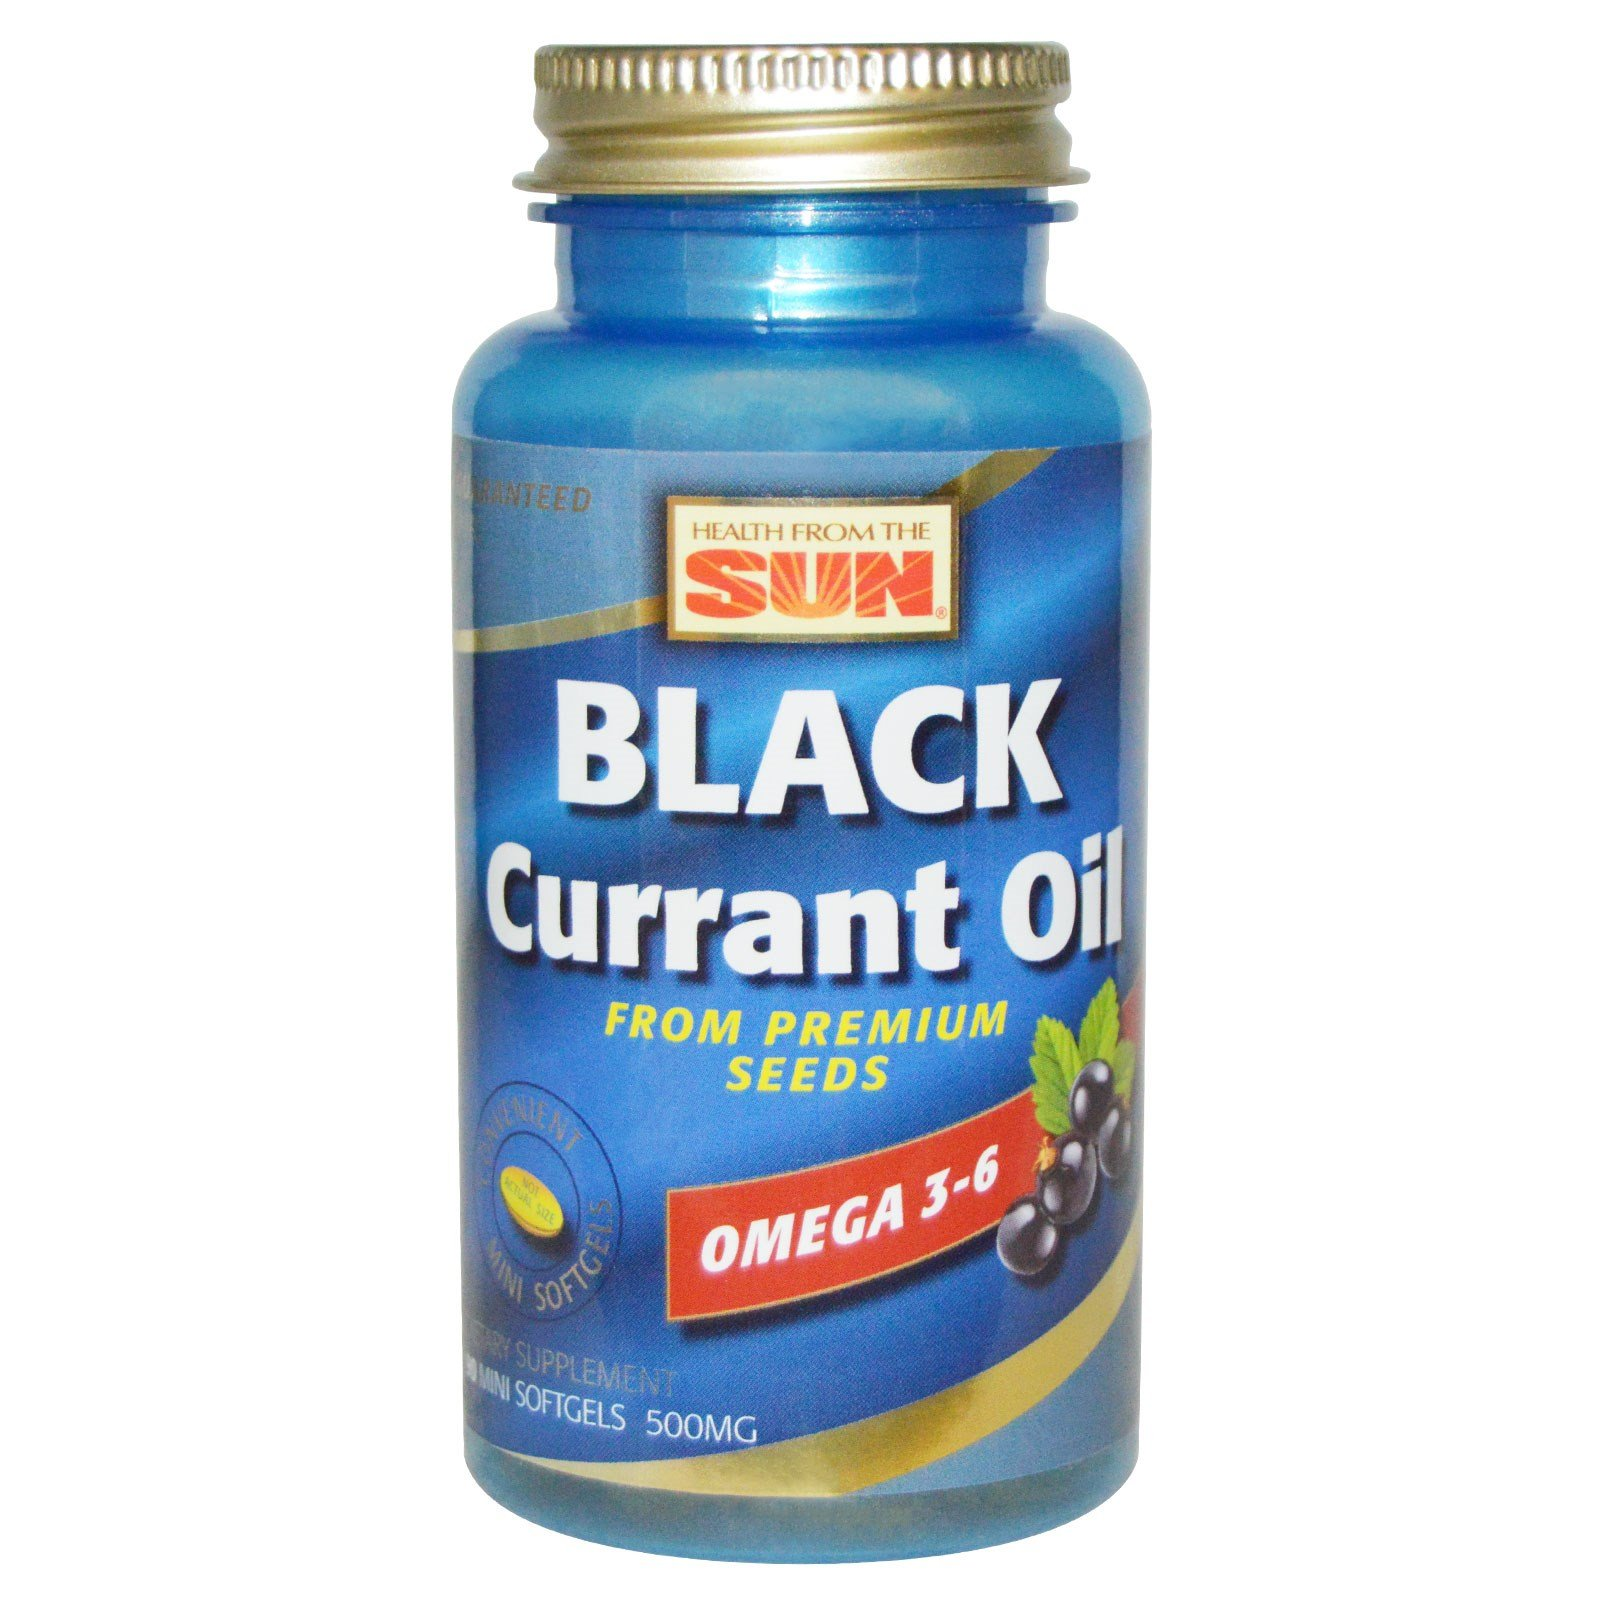 Health From The Sun, Black Currant Oil, 500 mg, 90 Mini Softgels - 2PC